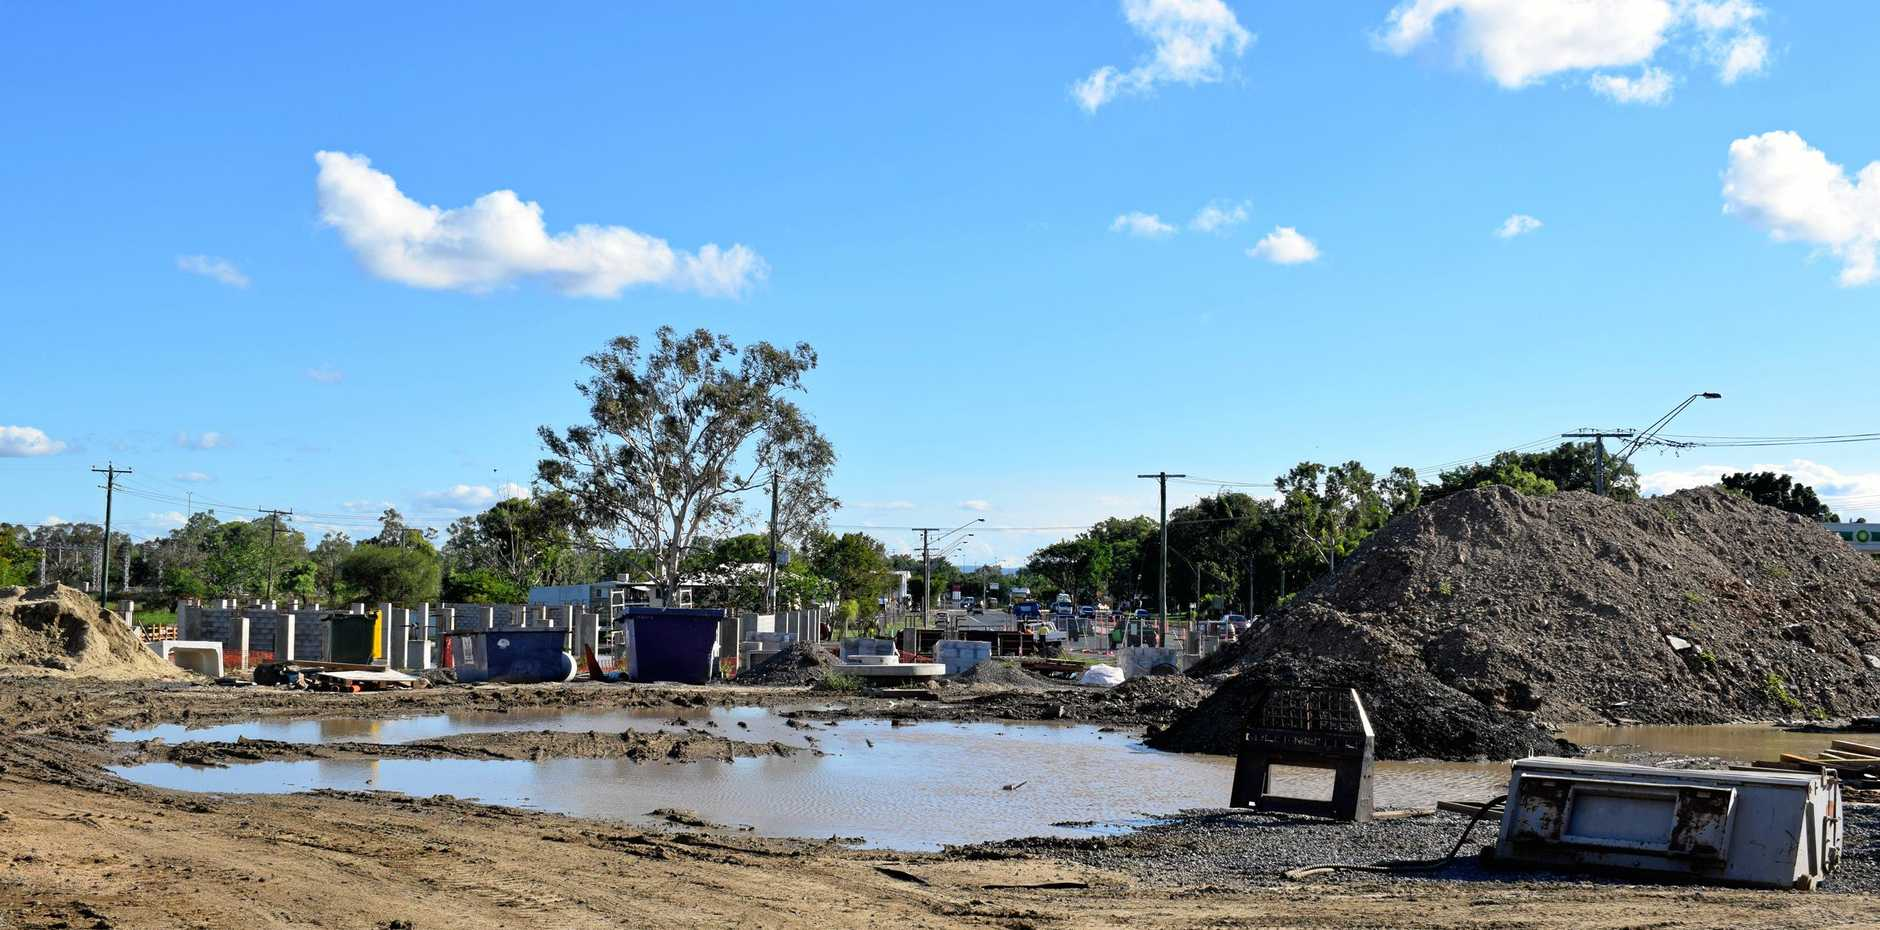 Construction at the Aldi site on Gladstone Rd.